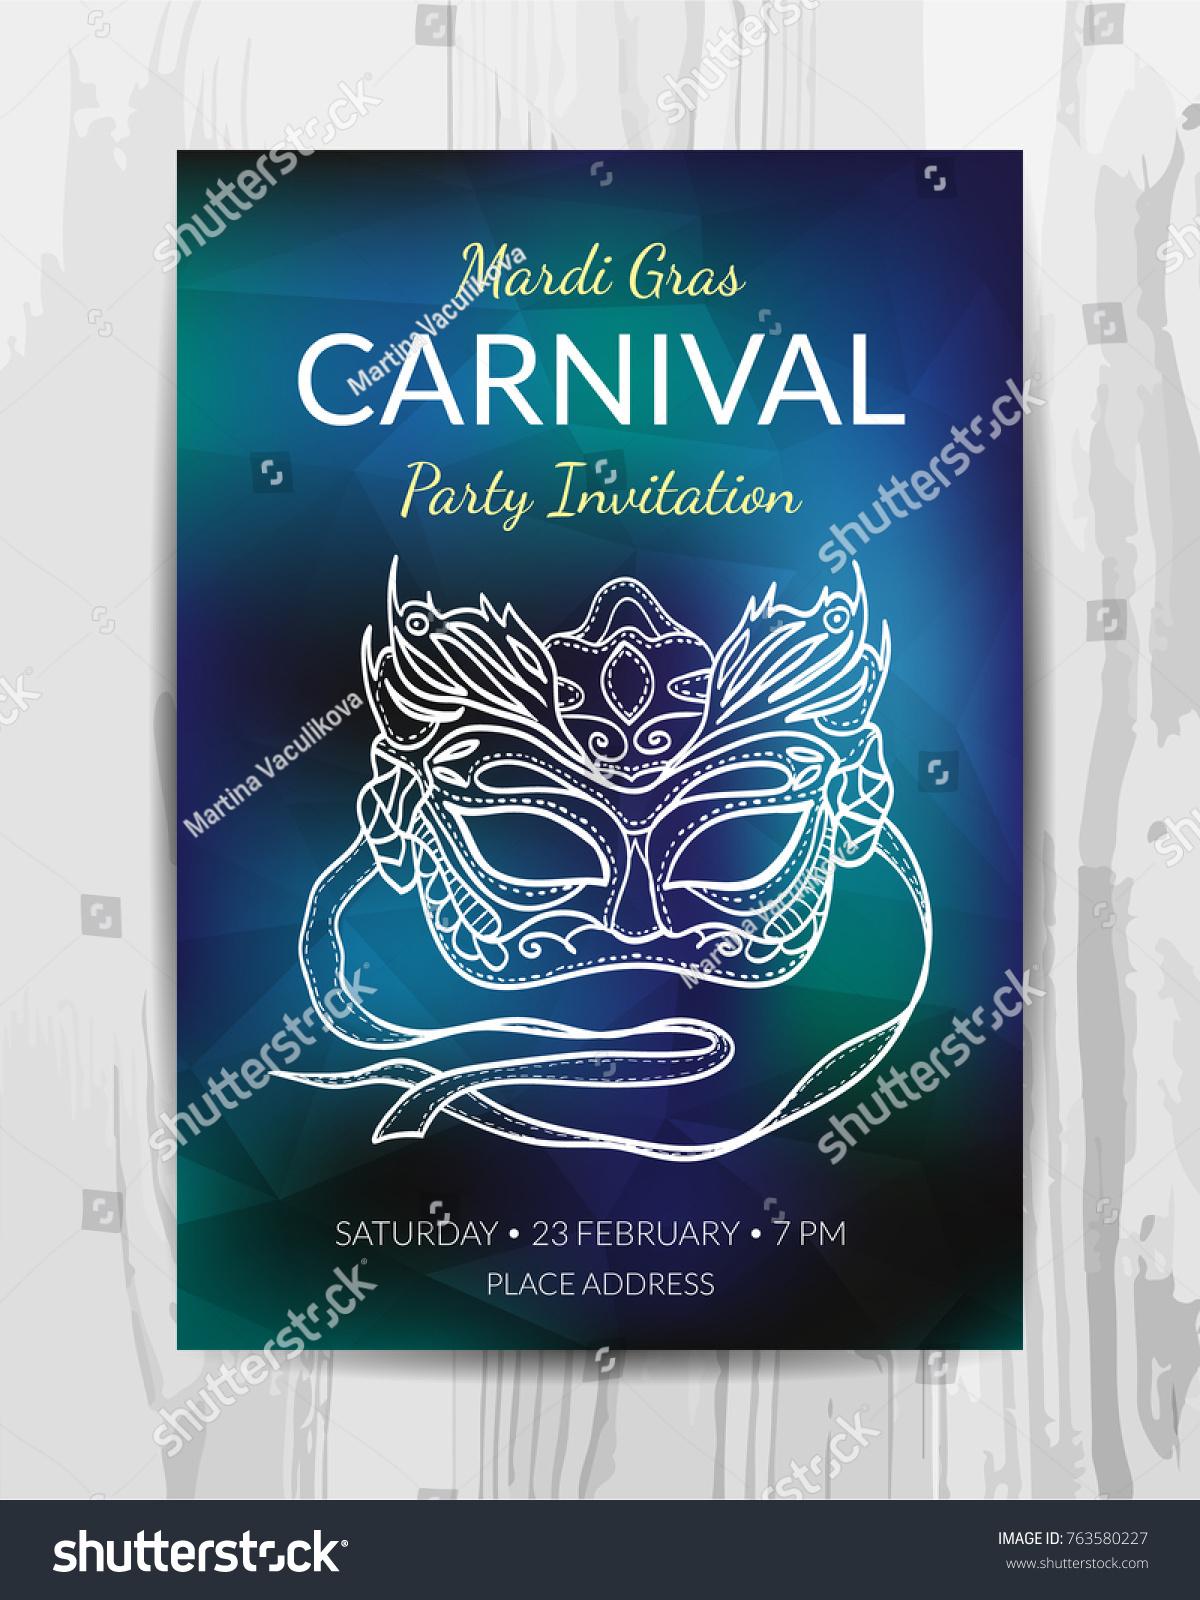 Carnival Party Invitation Card Mardi Gras Stock Vector 763580227 ...